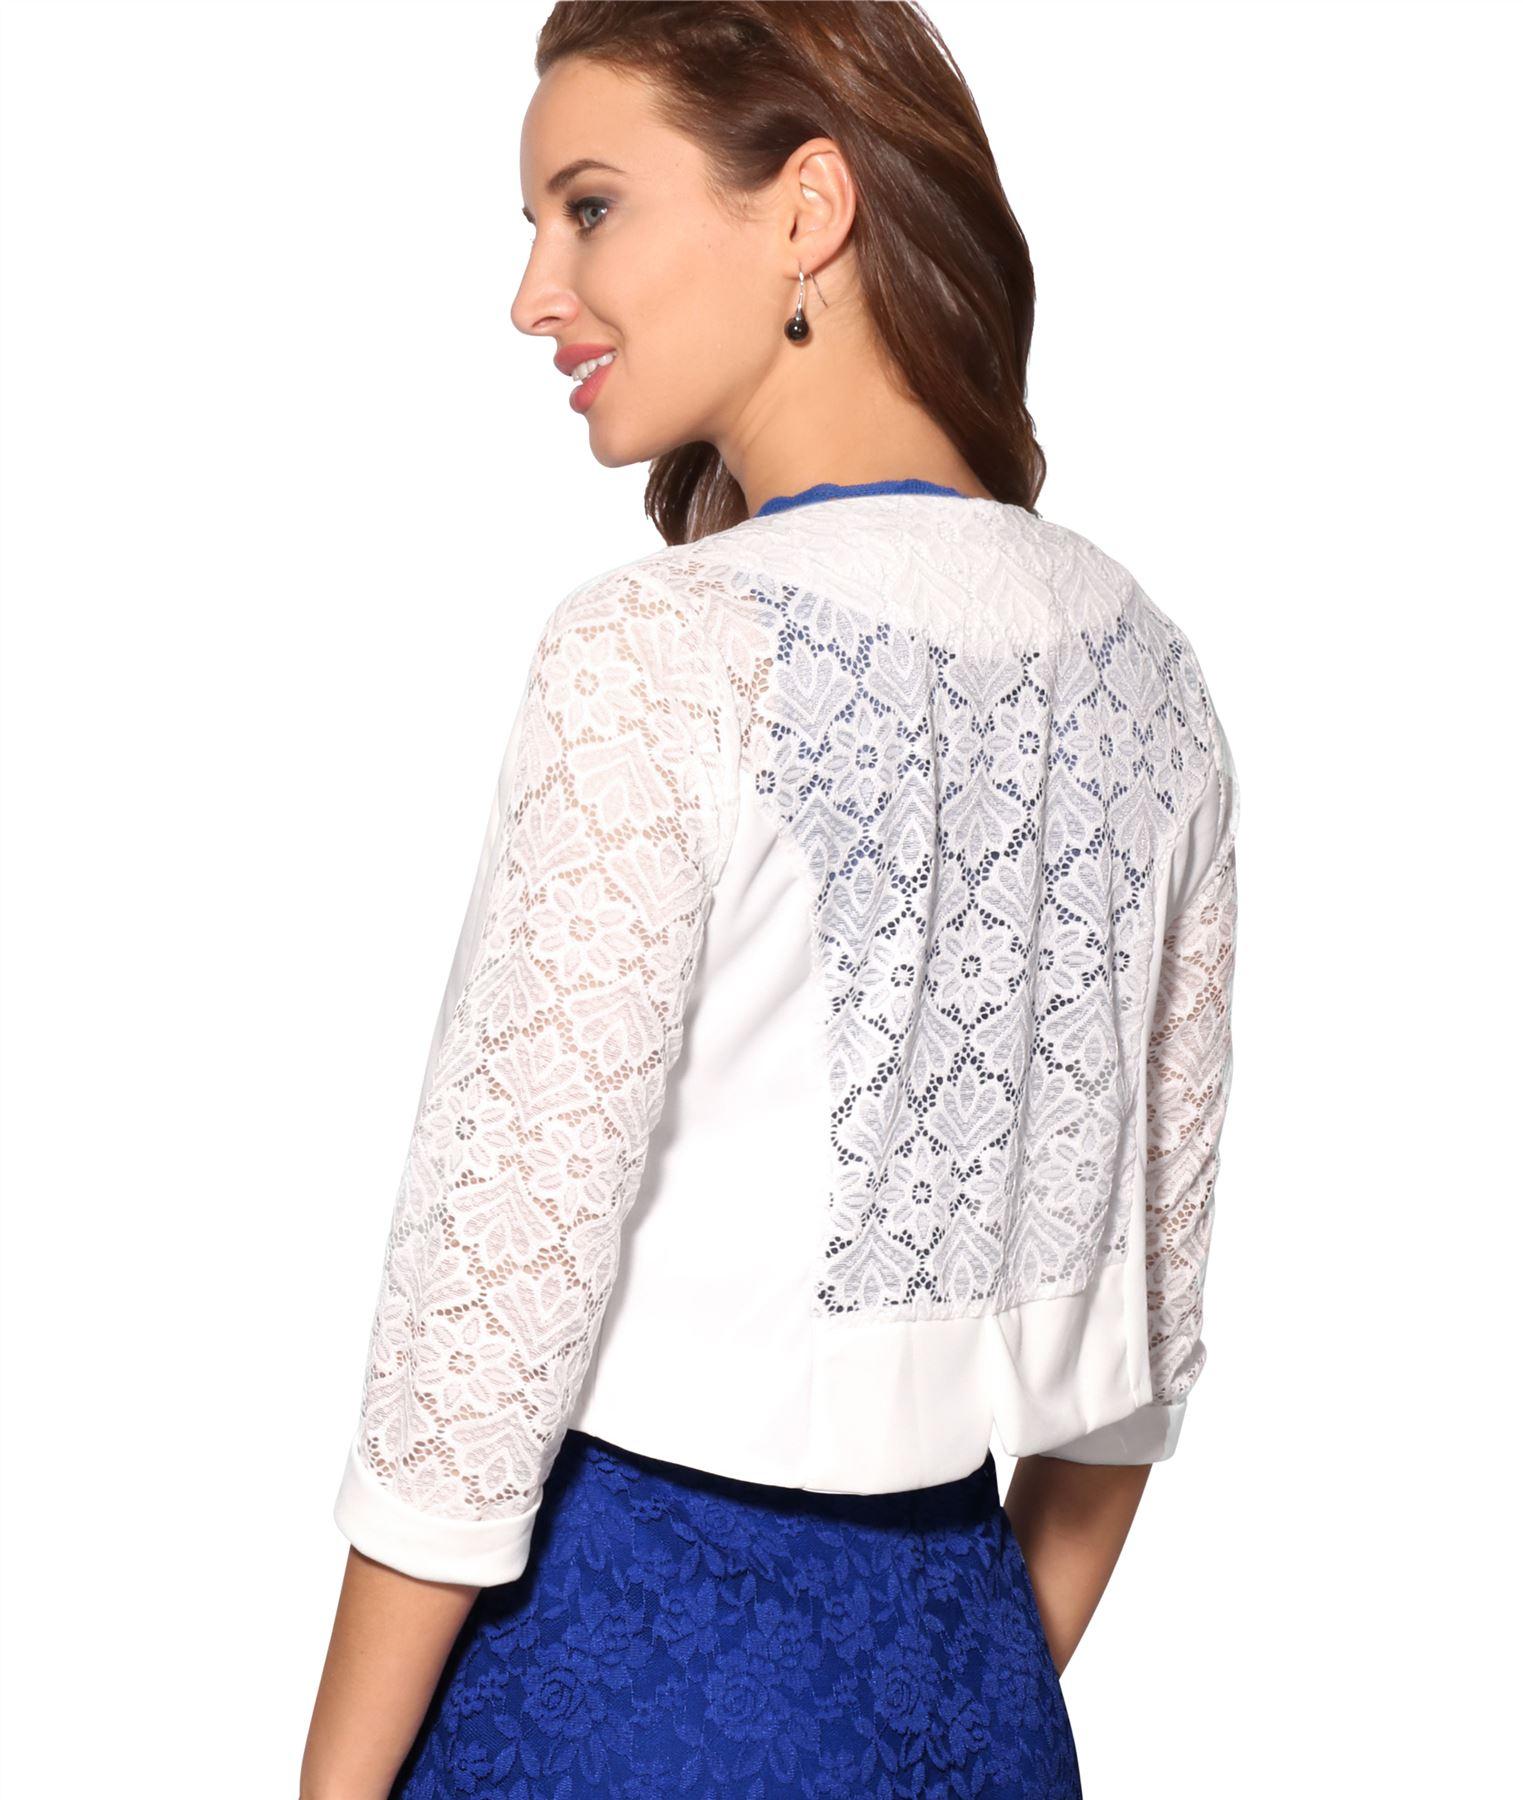 Womens-Ladies-Bolero-Lace-Shrug-Short-Sleeve-Cardigan-Cropped-Party-Top-Jacket thumbnail 6